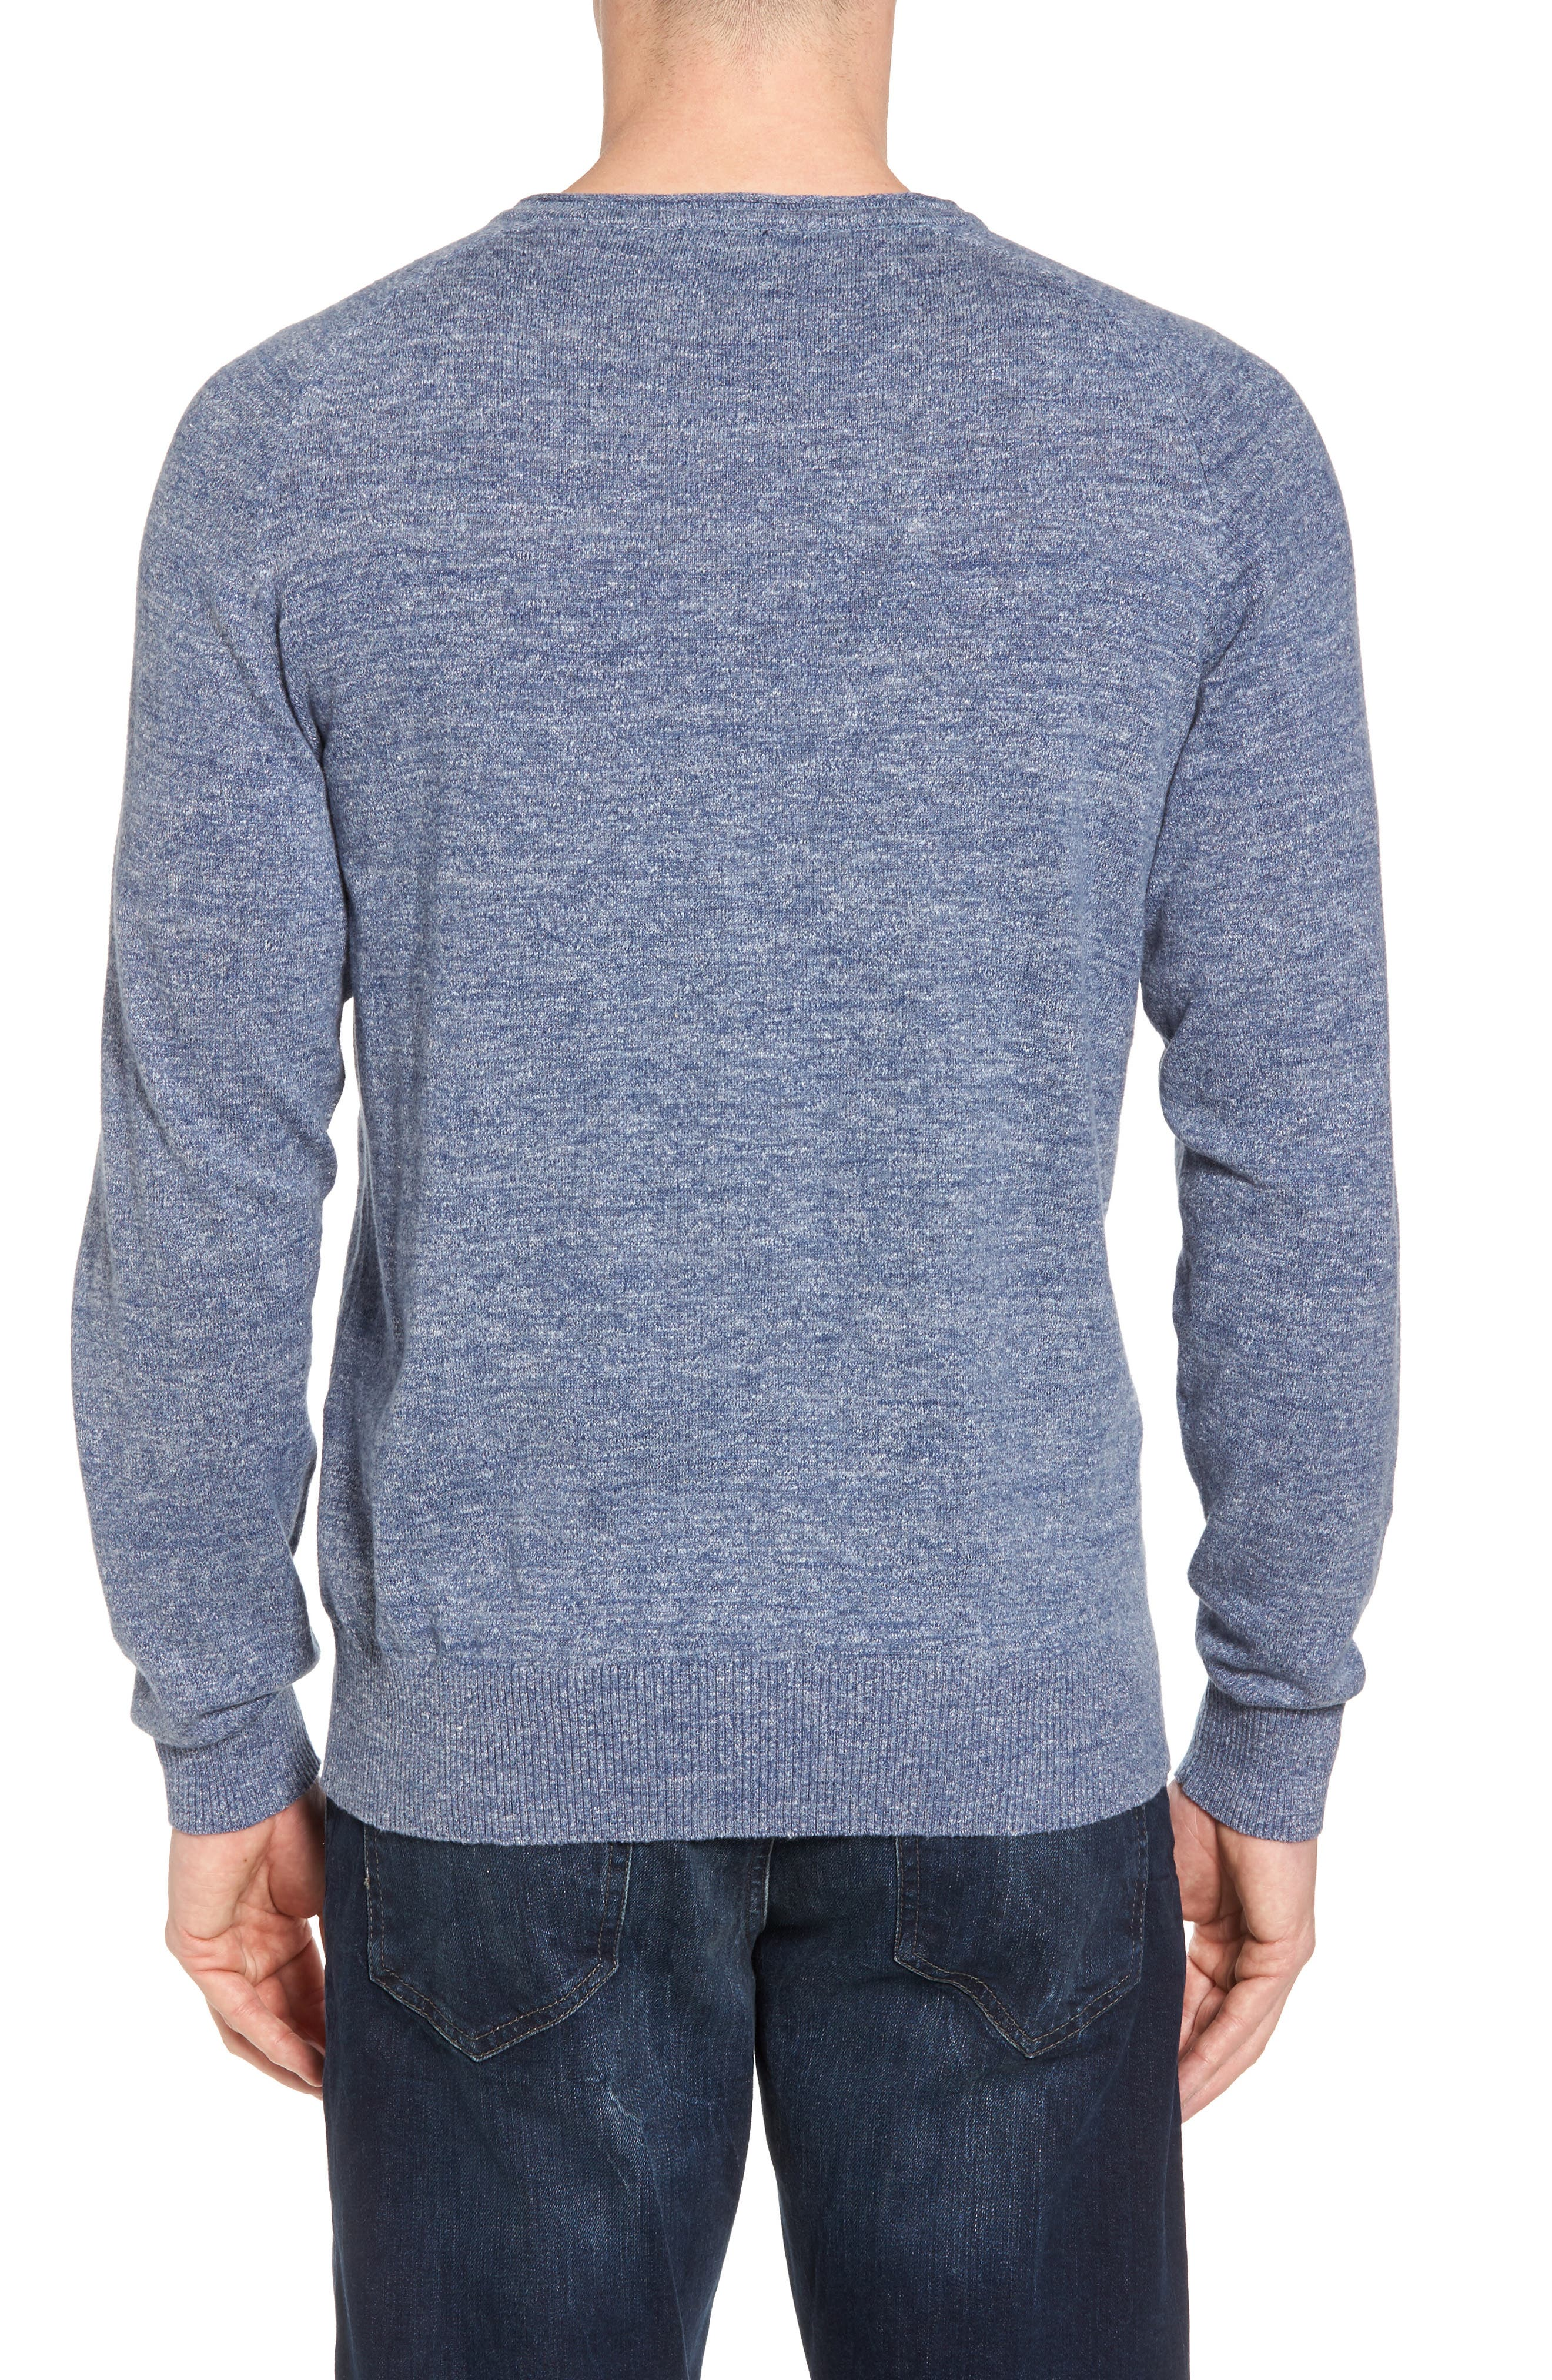 Arbors Cotton V-Neck Sweater,                             Alternate thumbnail 5, color,